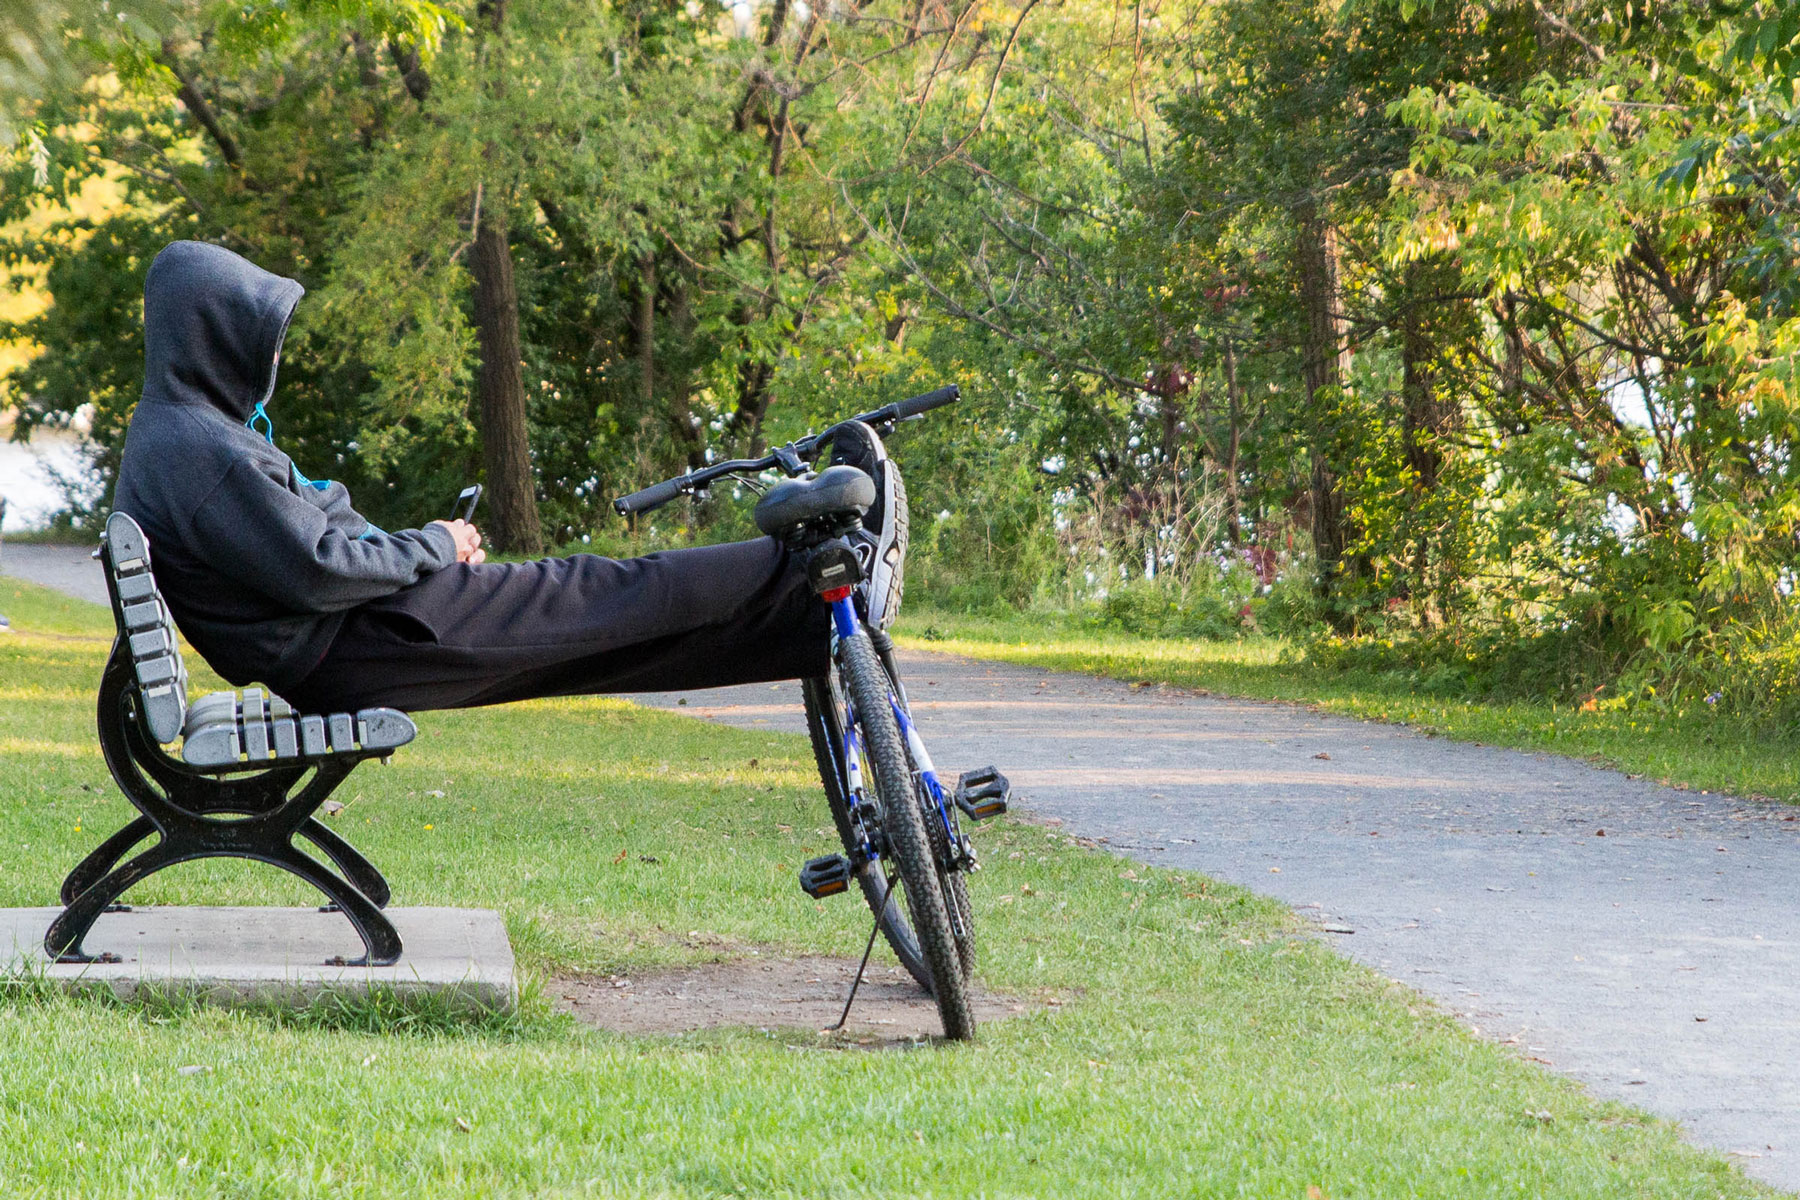 Un ciclyste bien relax, parc Maurice-Richard, Ahuntsic